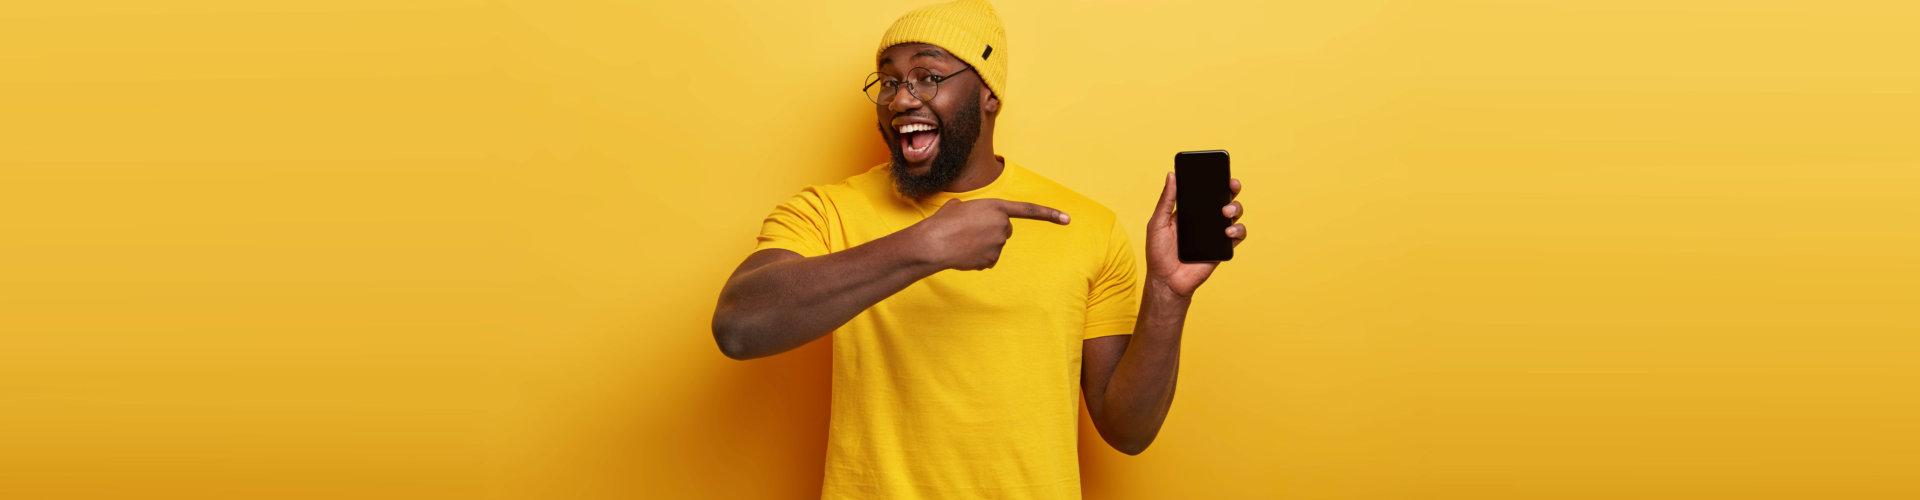 a man pointing at his phone